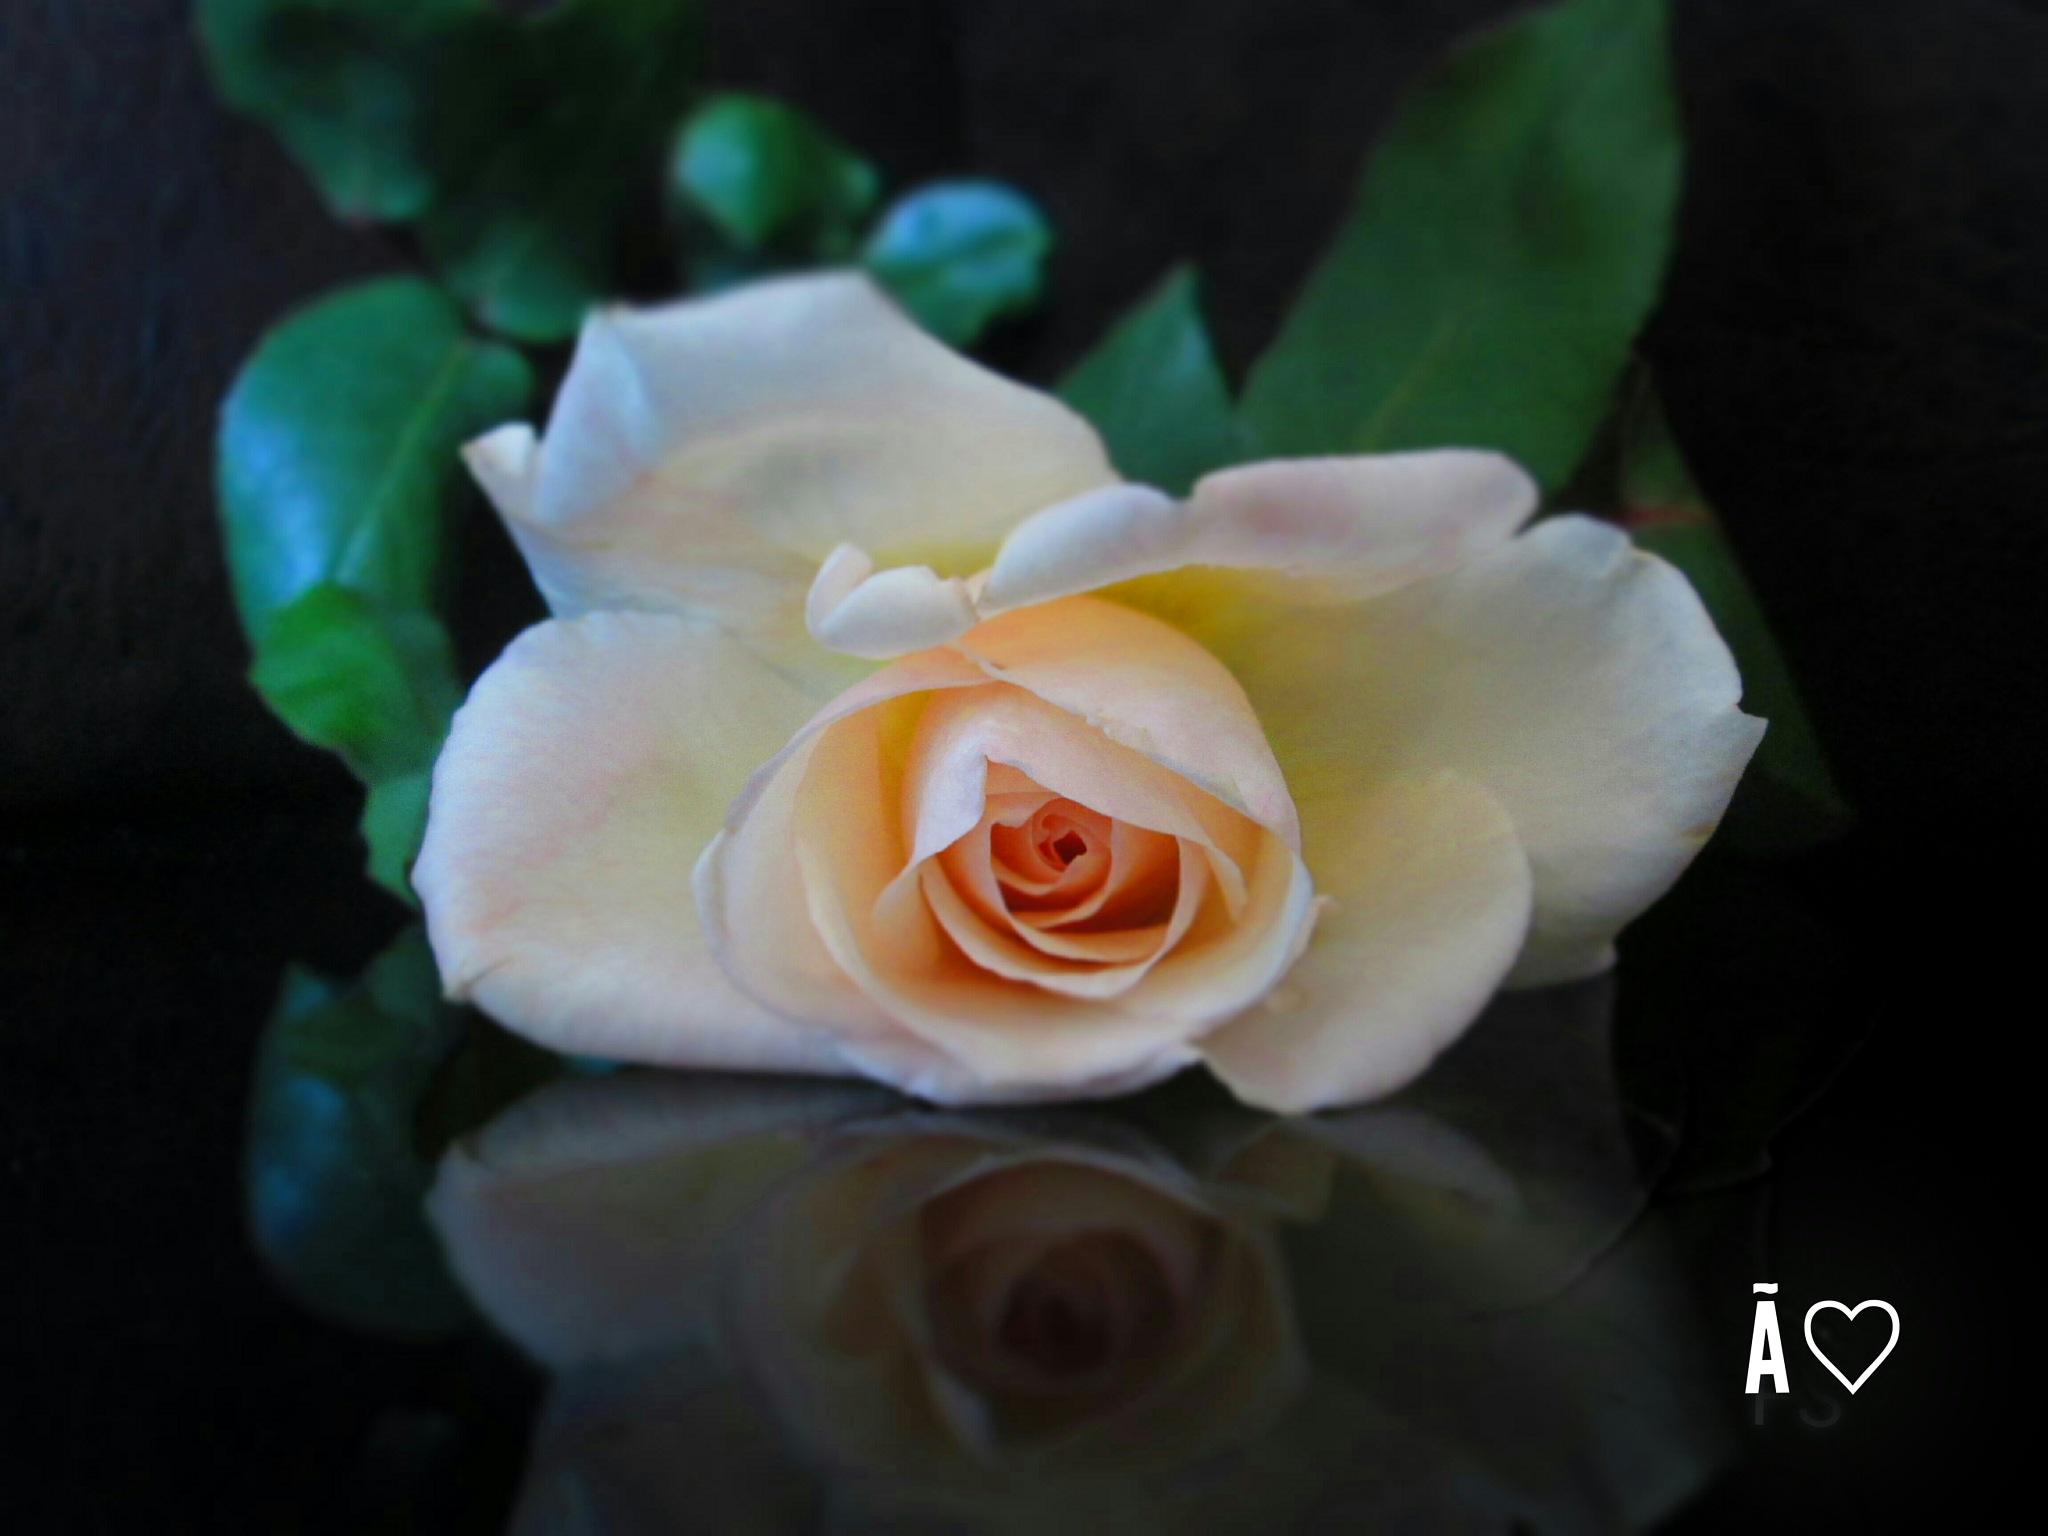 ROSE by Ãlaa Ay